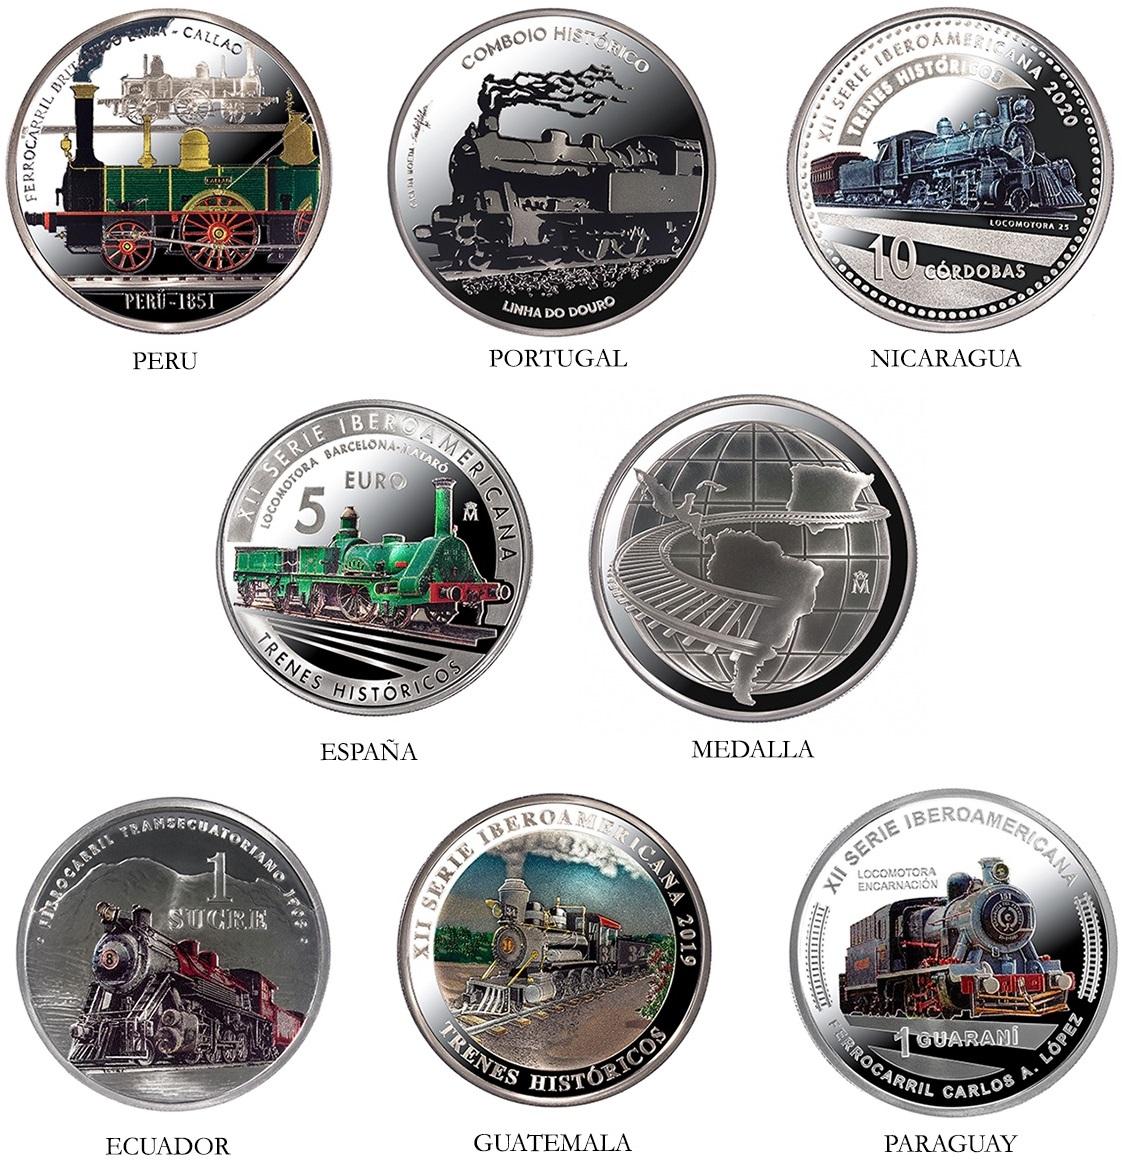 serie-ibero-americaine-2020-trains-historiques-rev